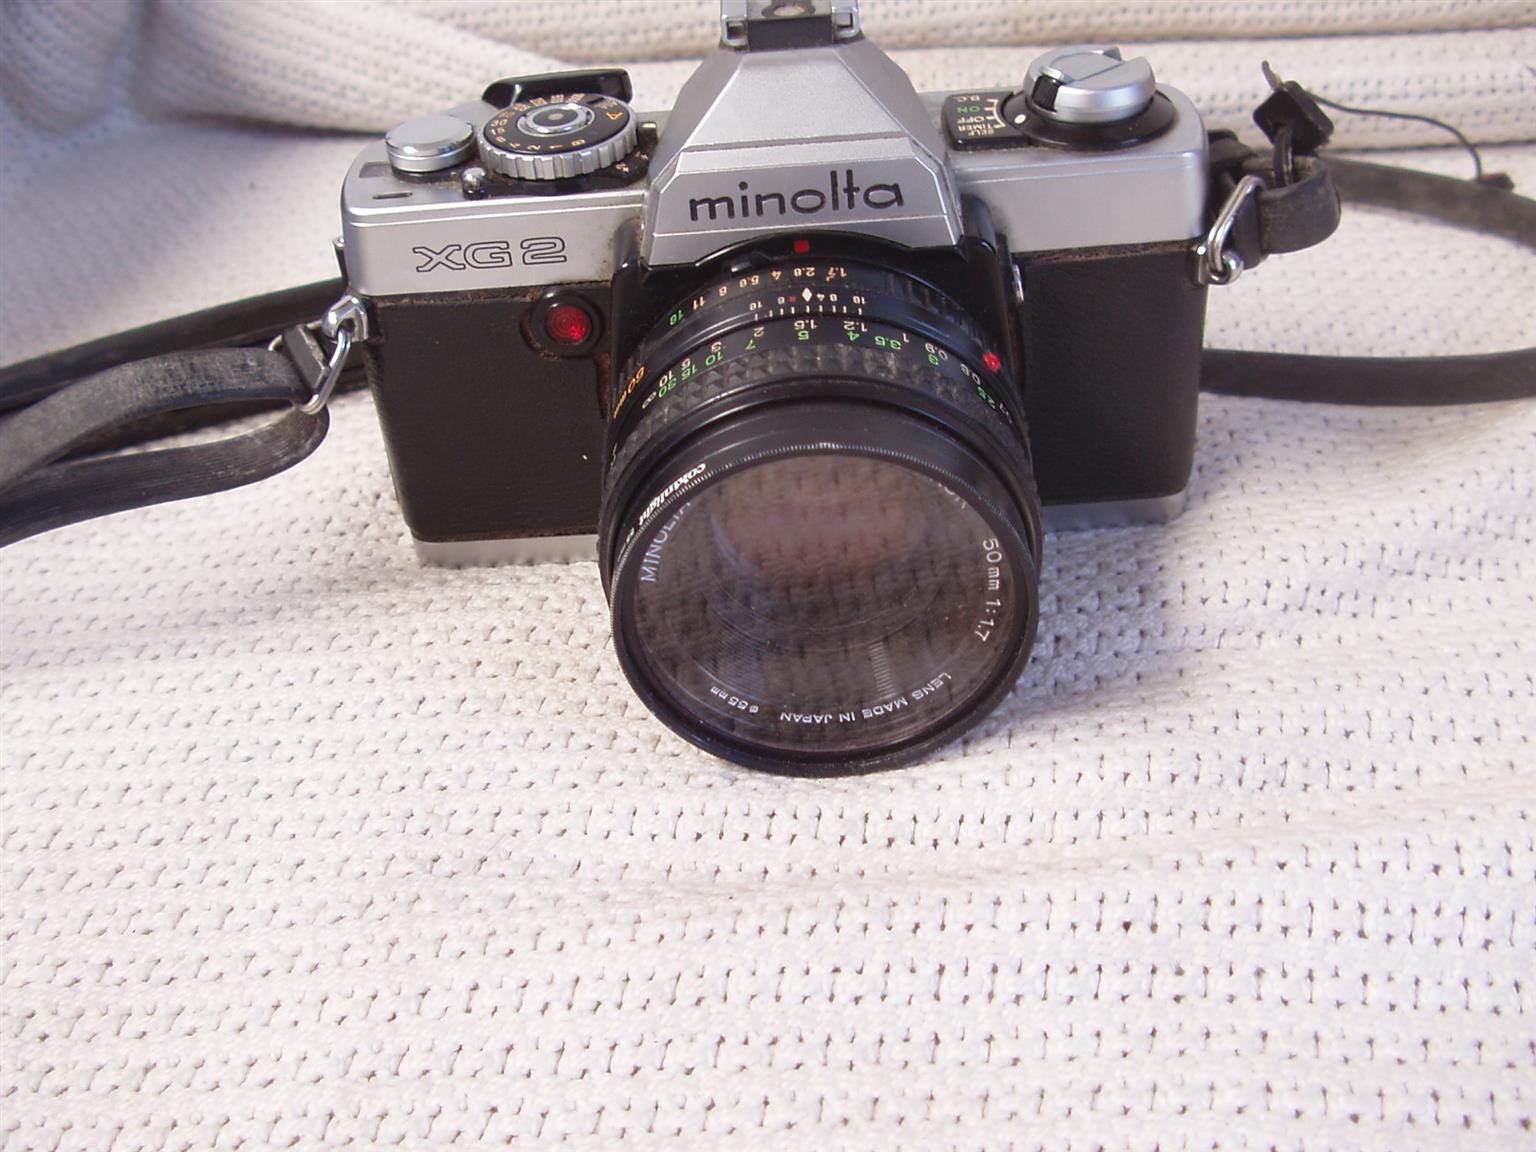 Minolta XG 2 Film Camera with Minolta Rokkor 50mm - in excellent condition